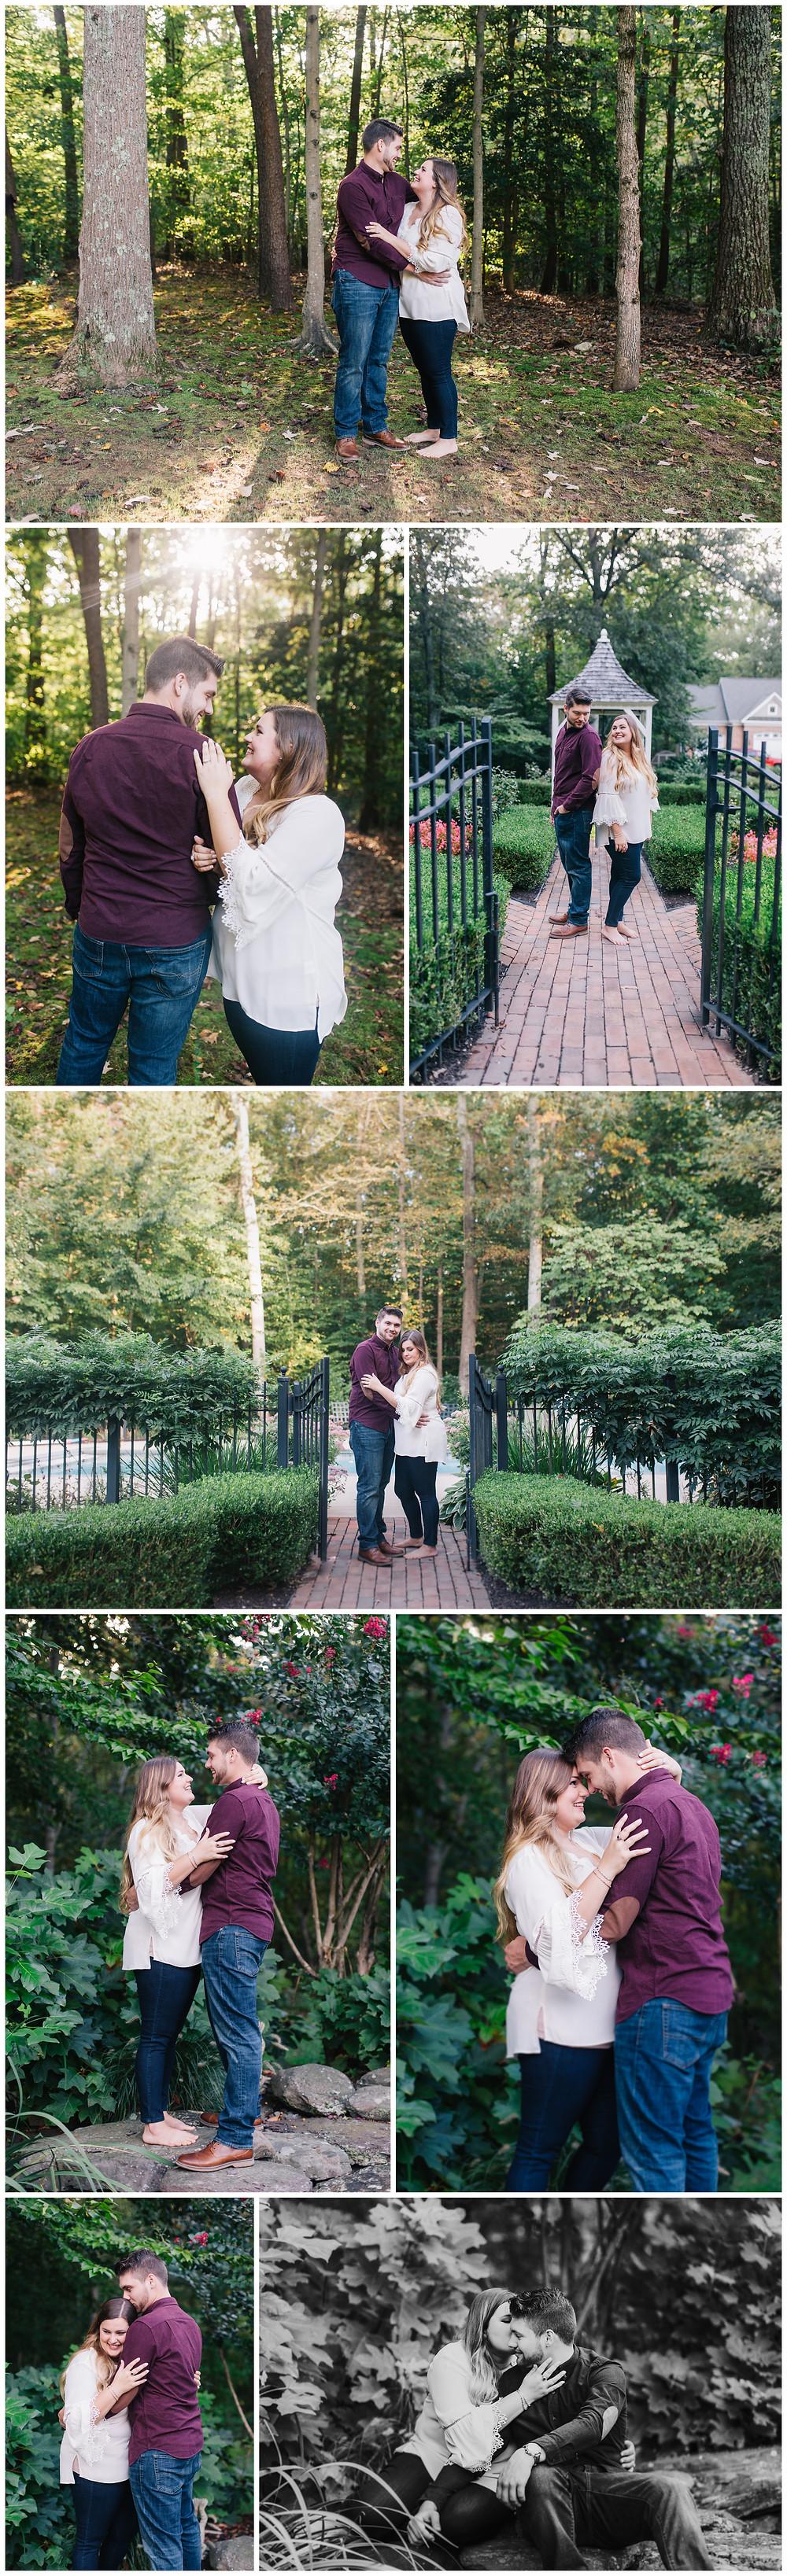 September sunset engagement portraits in Maryland by Katherine Elizabeth Photography